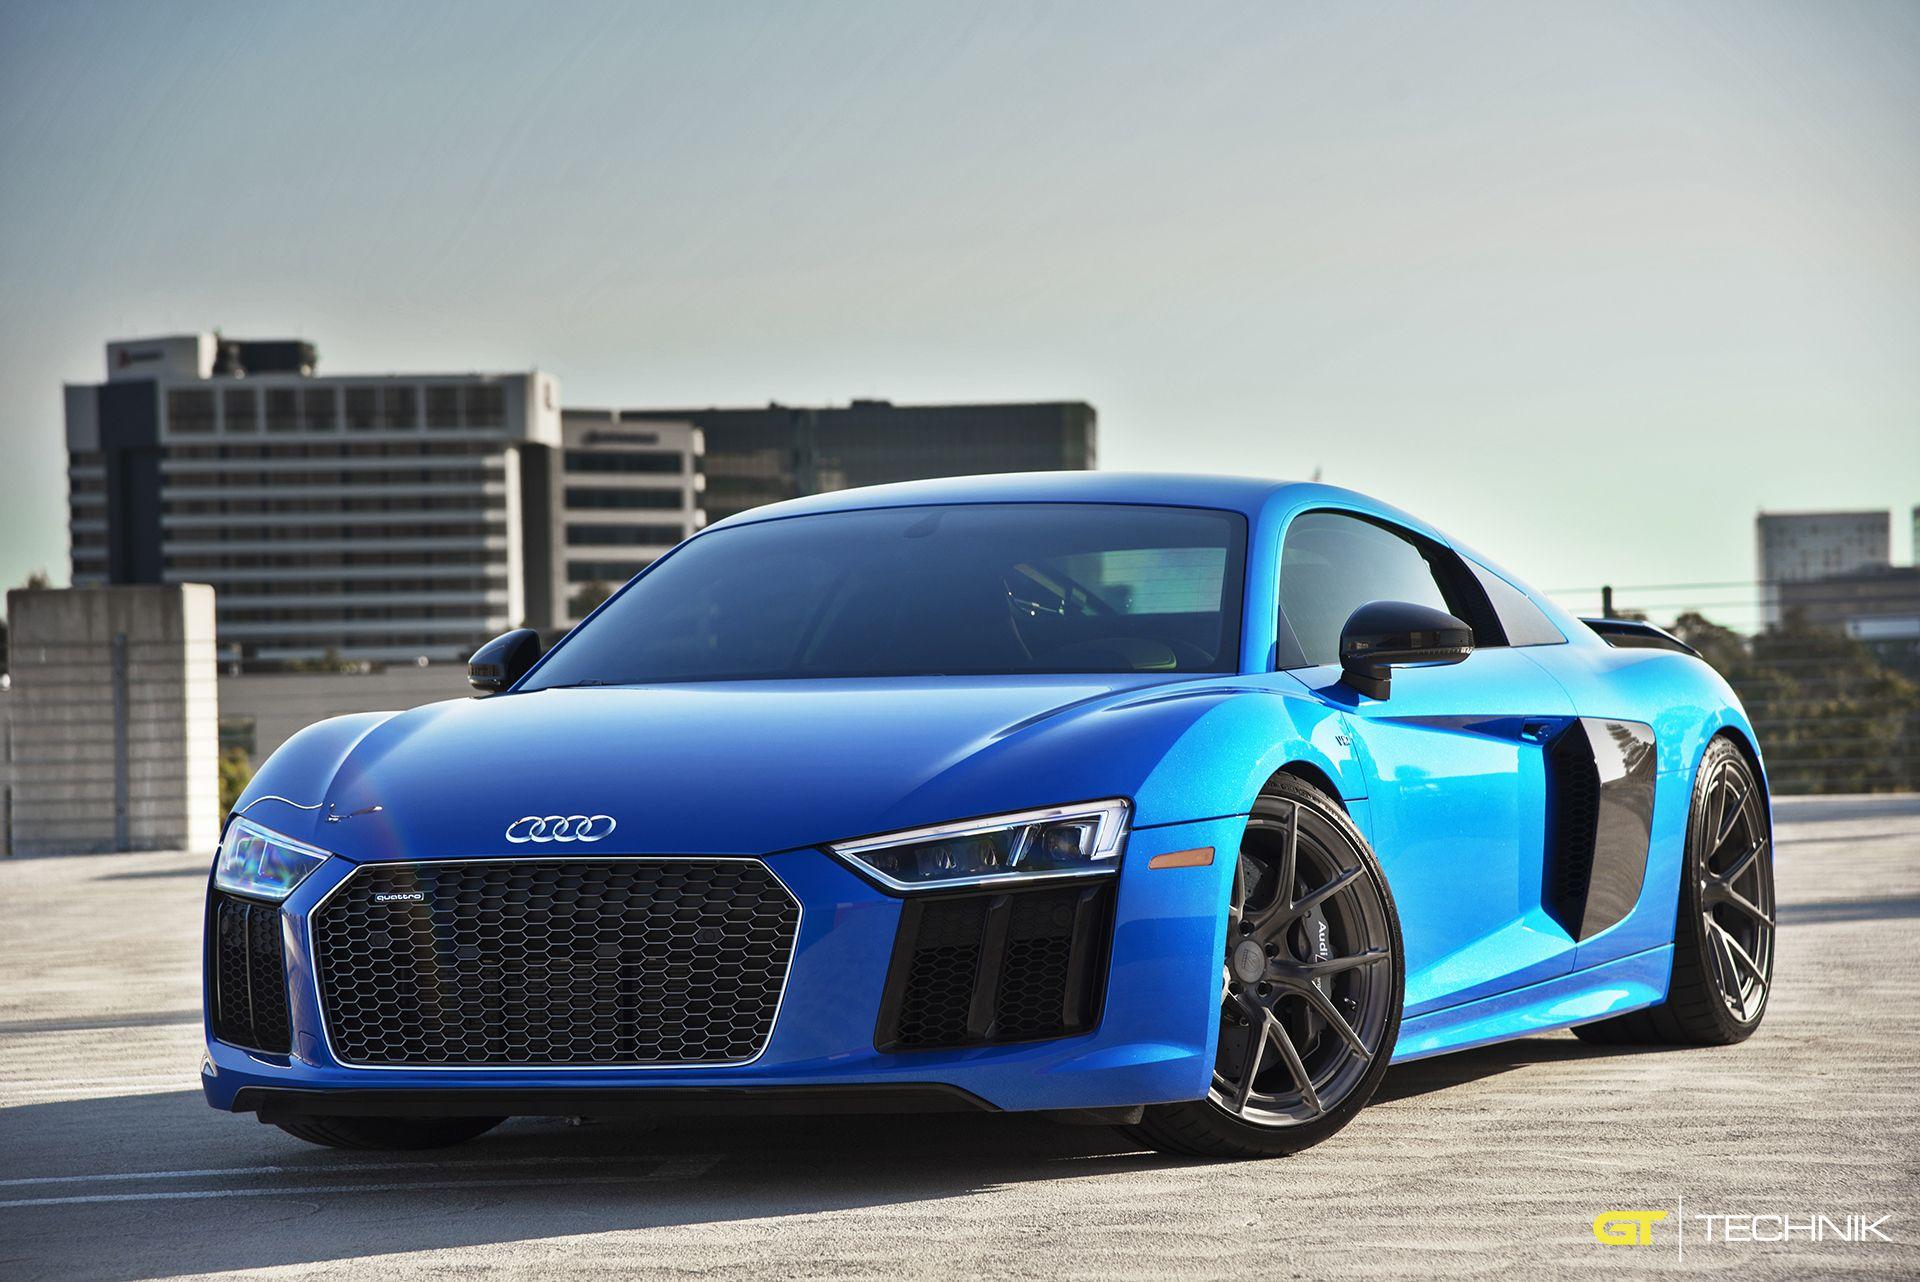 Video 802 Hp Supercharged Audi R8 V10 Plus Vs 750 Hp Audi Rs7 Audi R8 V10 Audi R8 Audi R8 V10 Plus